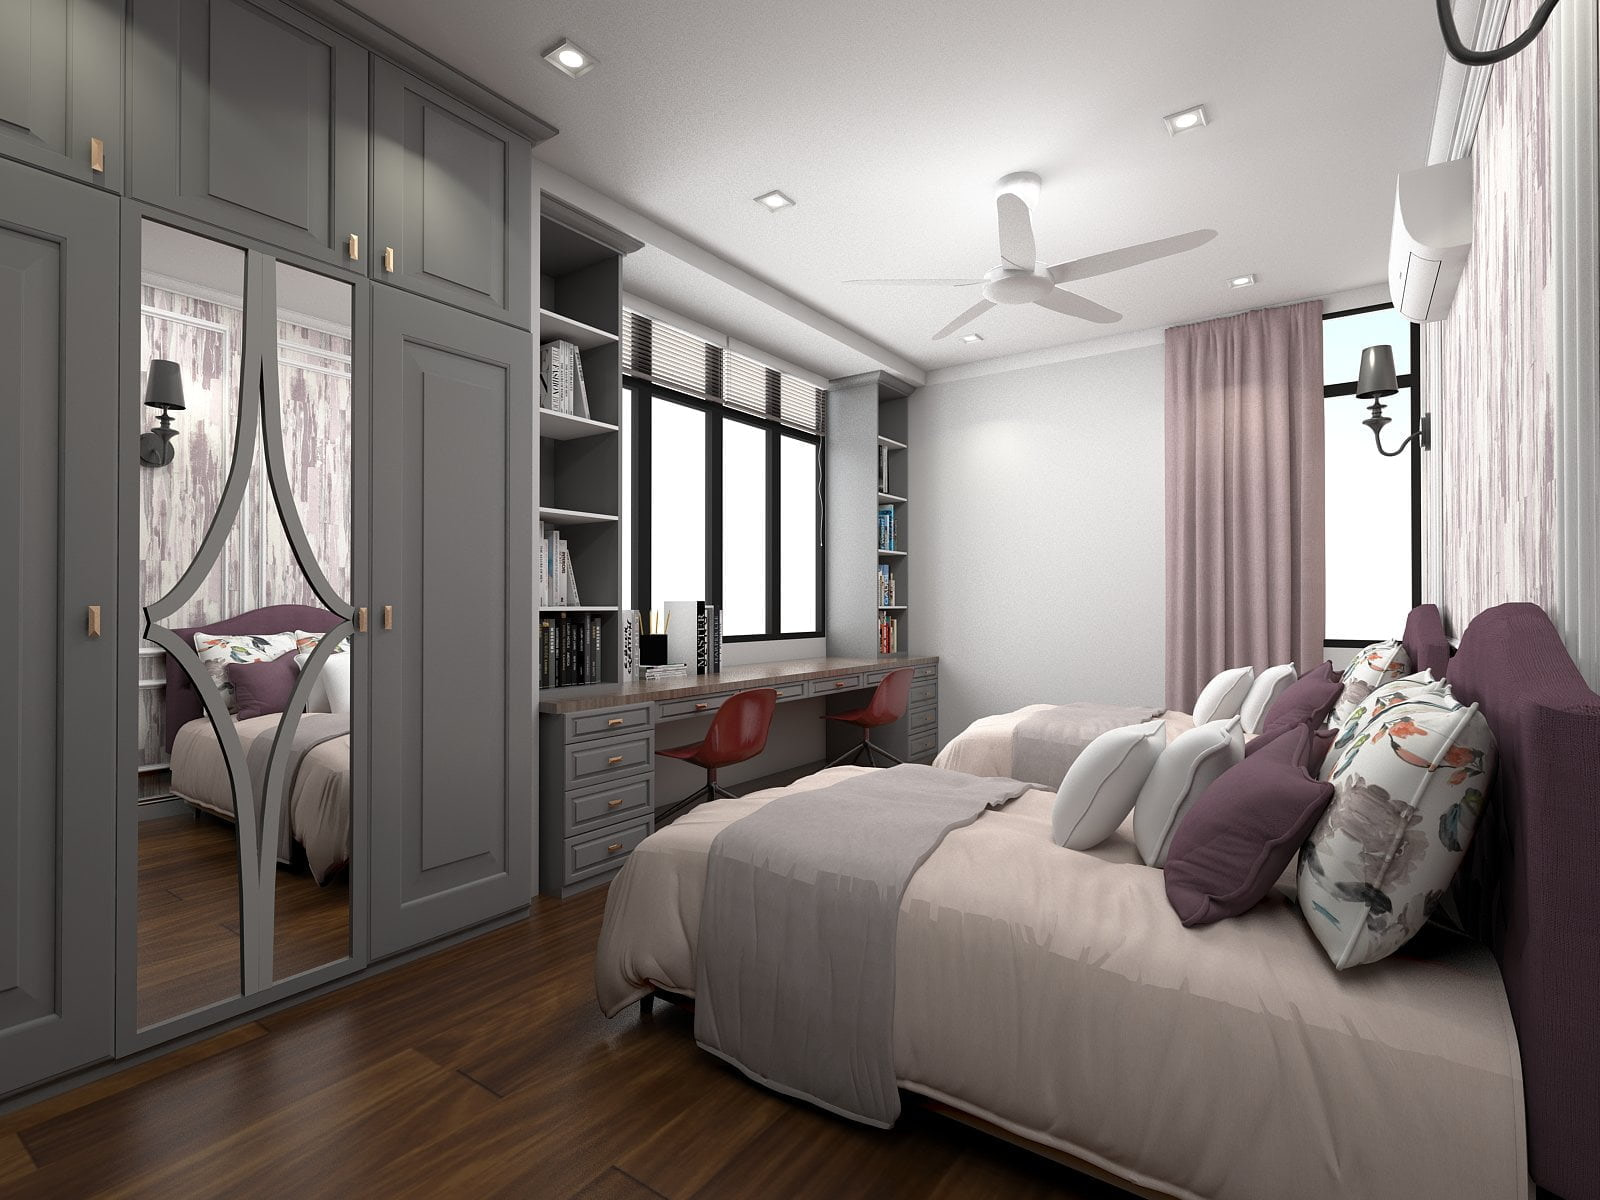 Laurea Home Furnishing Quotation Request | Laurea 3